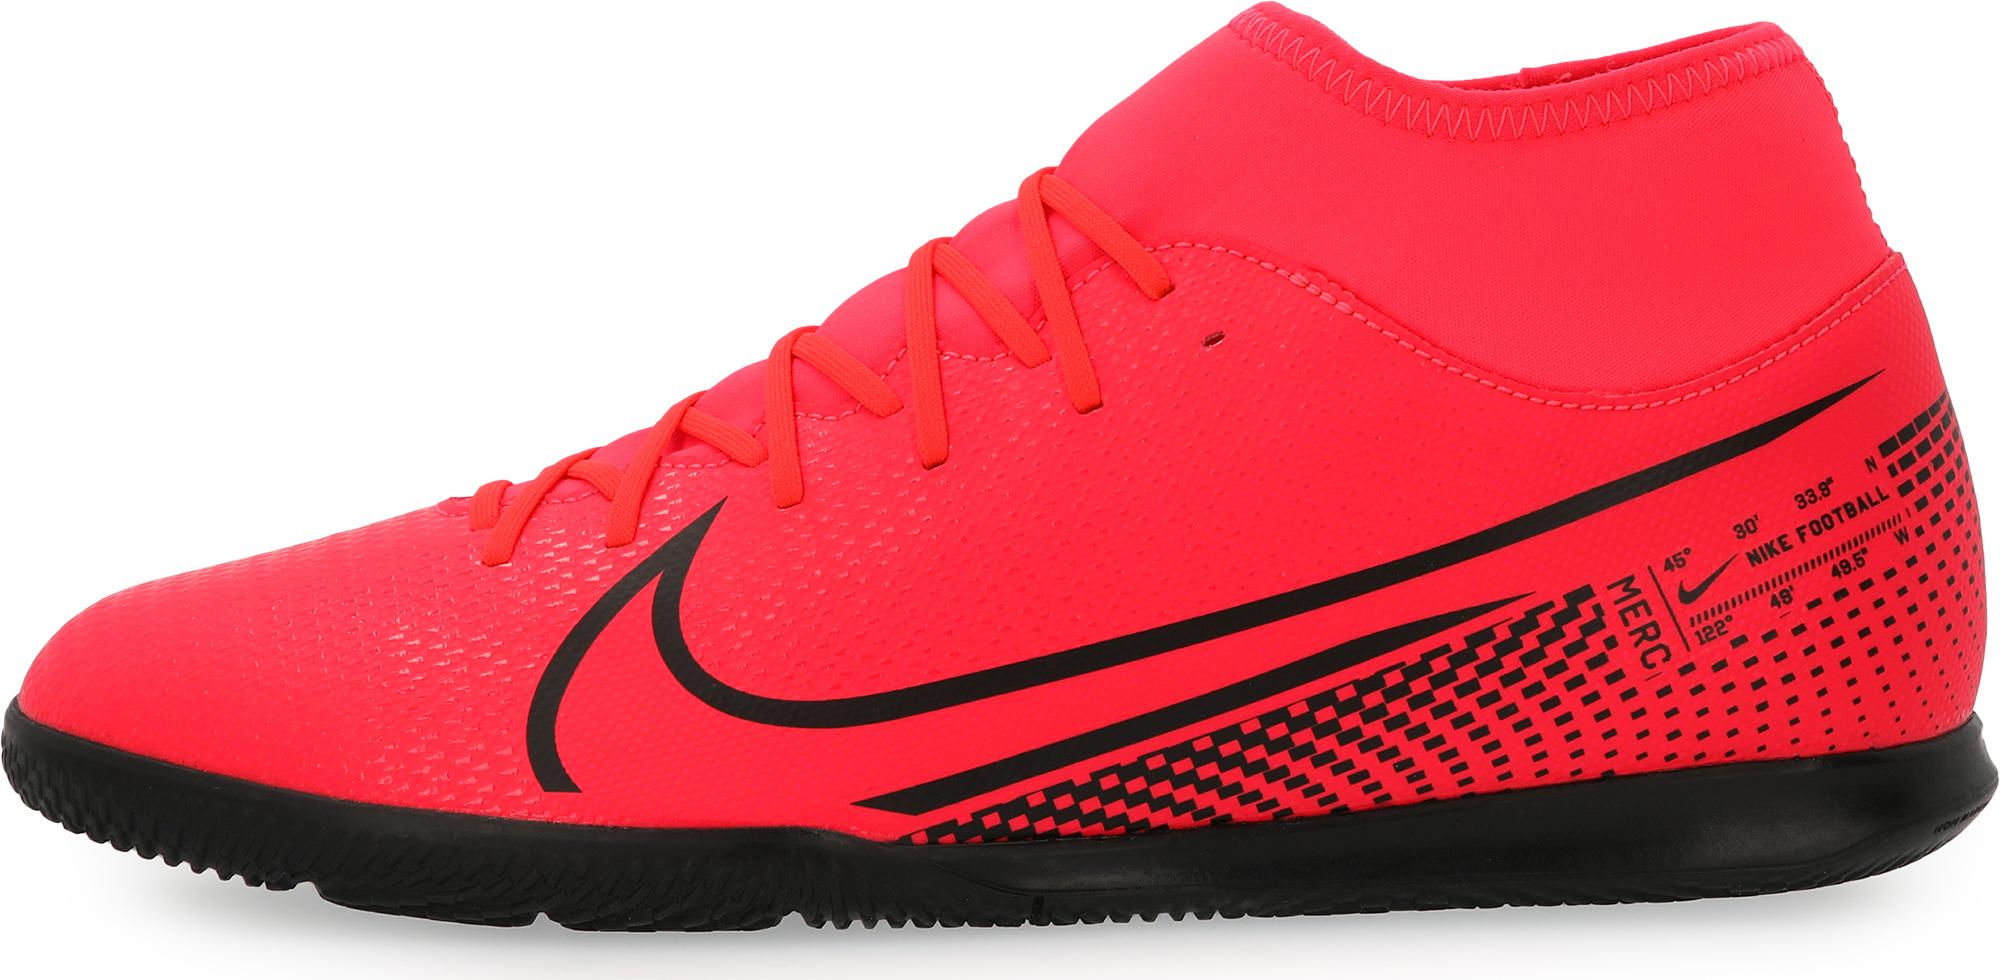 Фото - Nike nike бутсы мужские nike superfly 7 academy ag размер 43 5